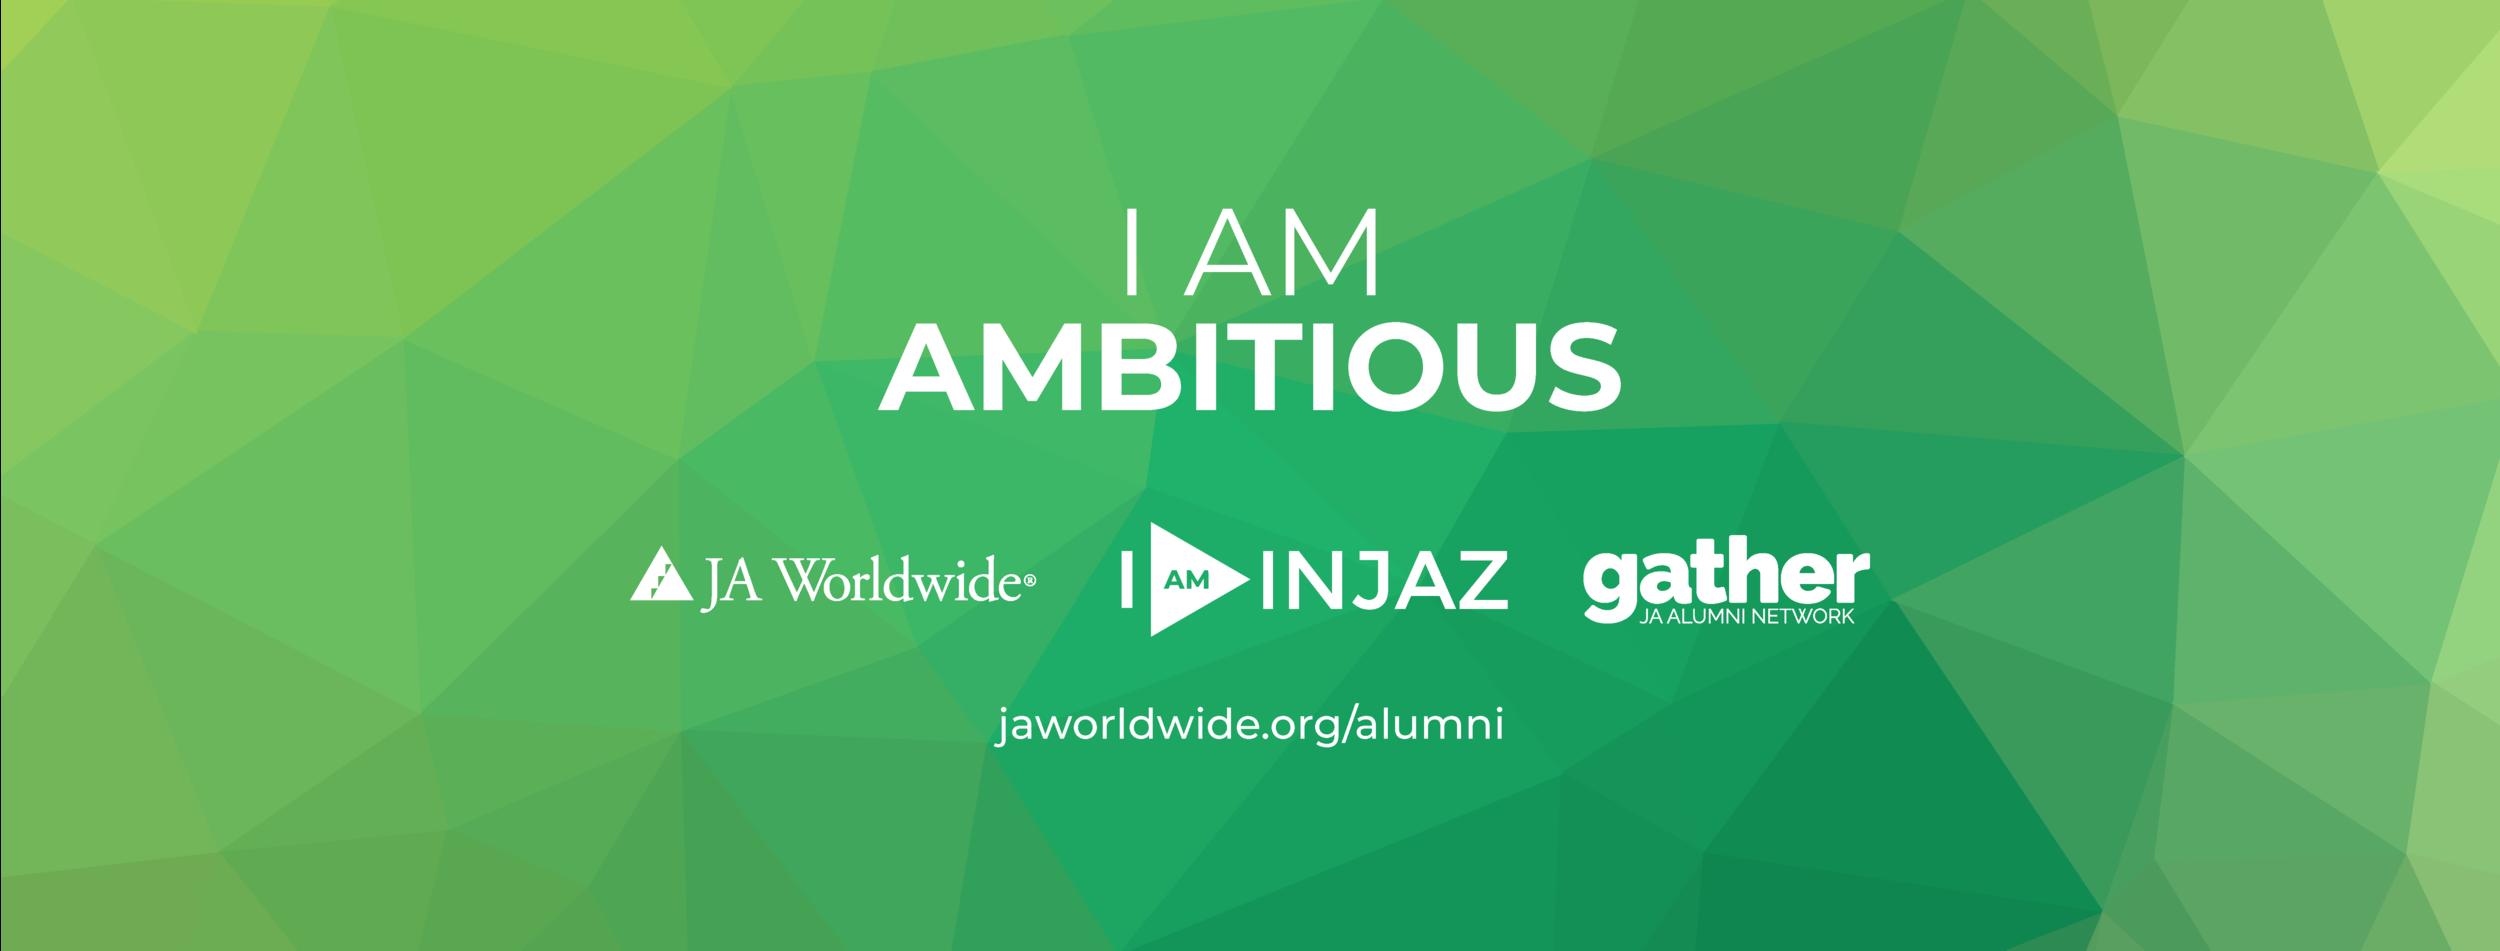 I am ambitious-I am INJAZ-Facebook banner.png